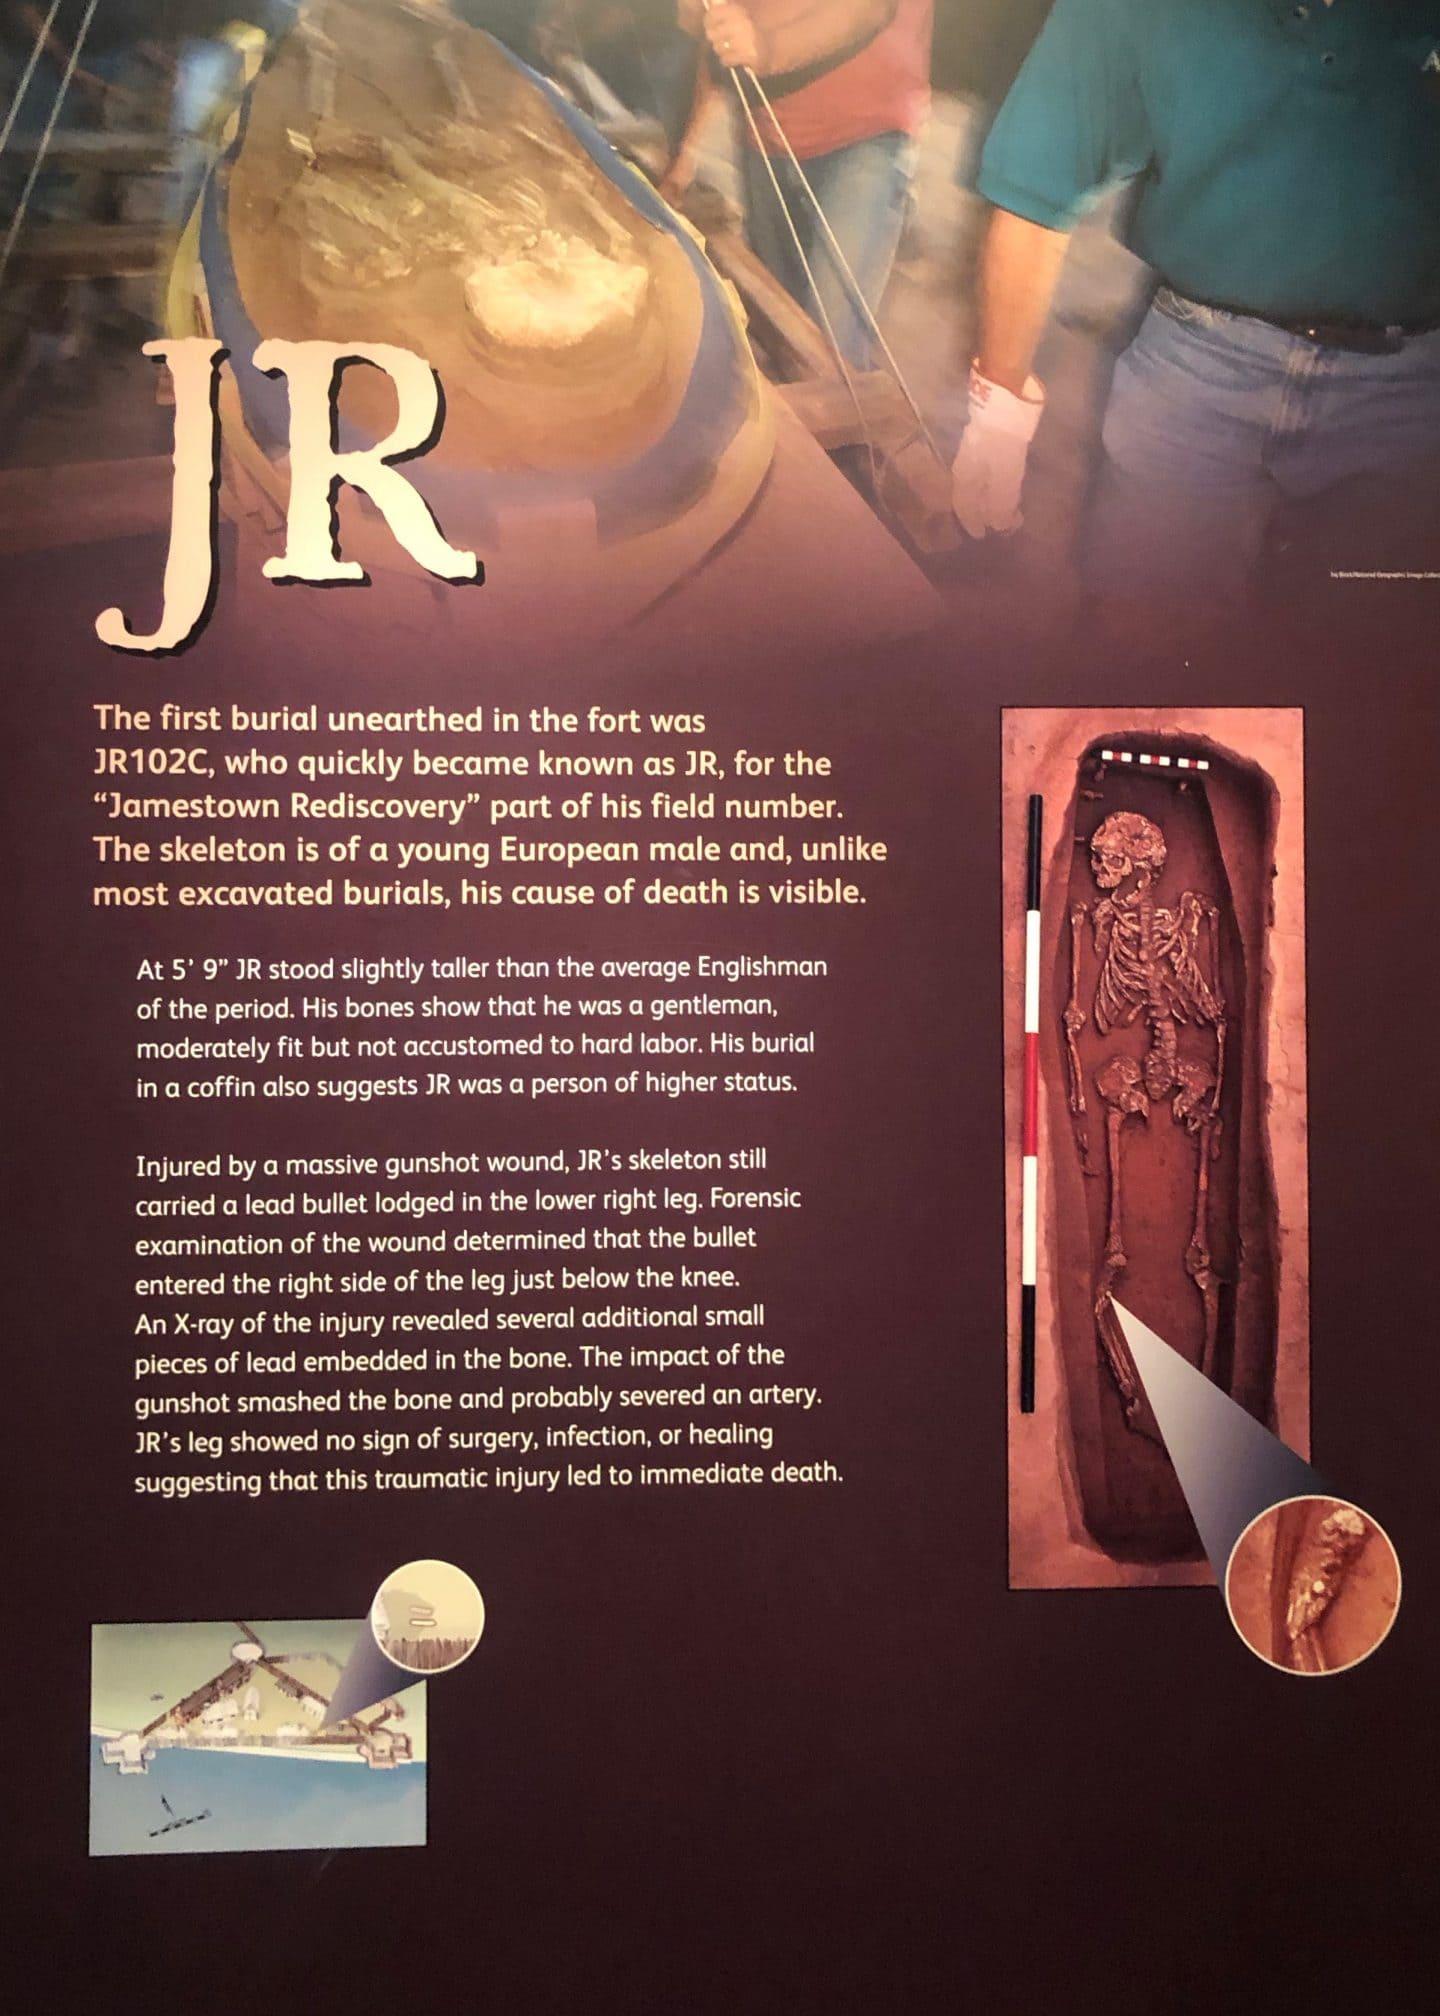 canibilism in historic Jamestown Virginia